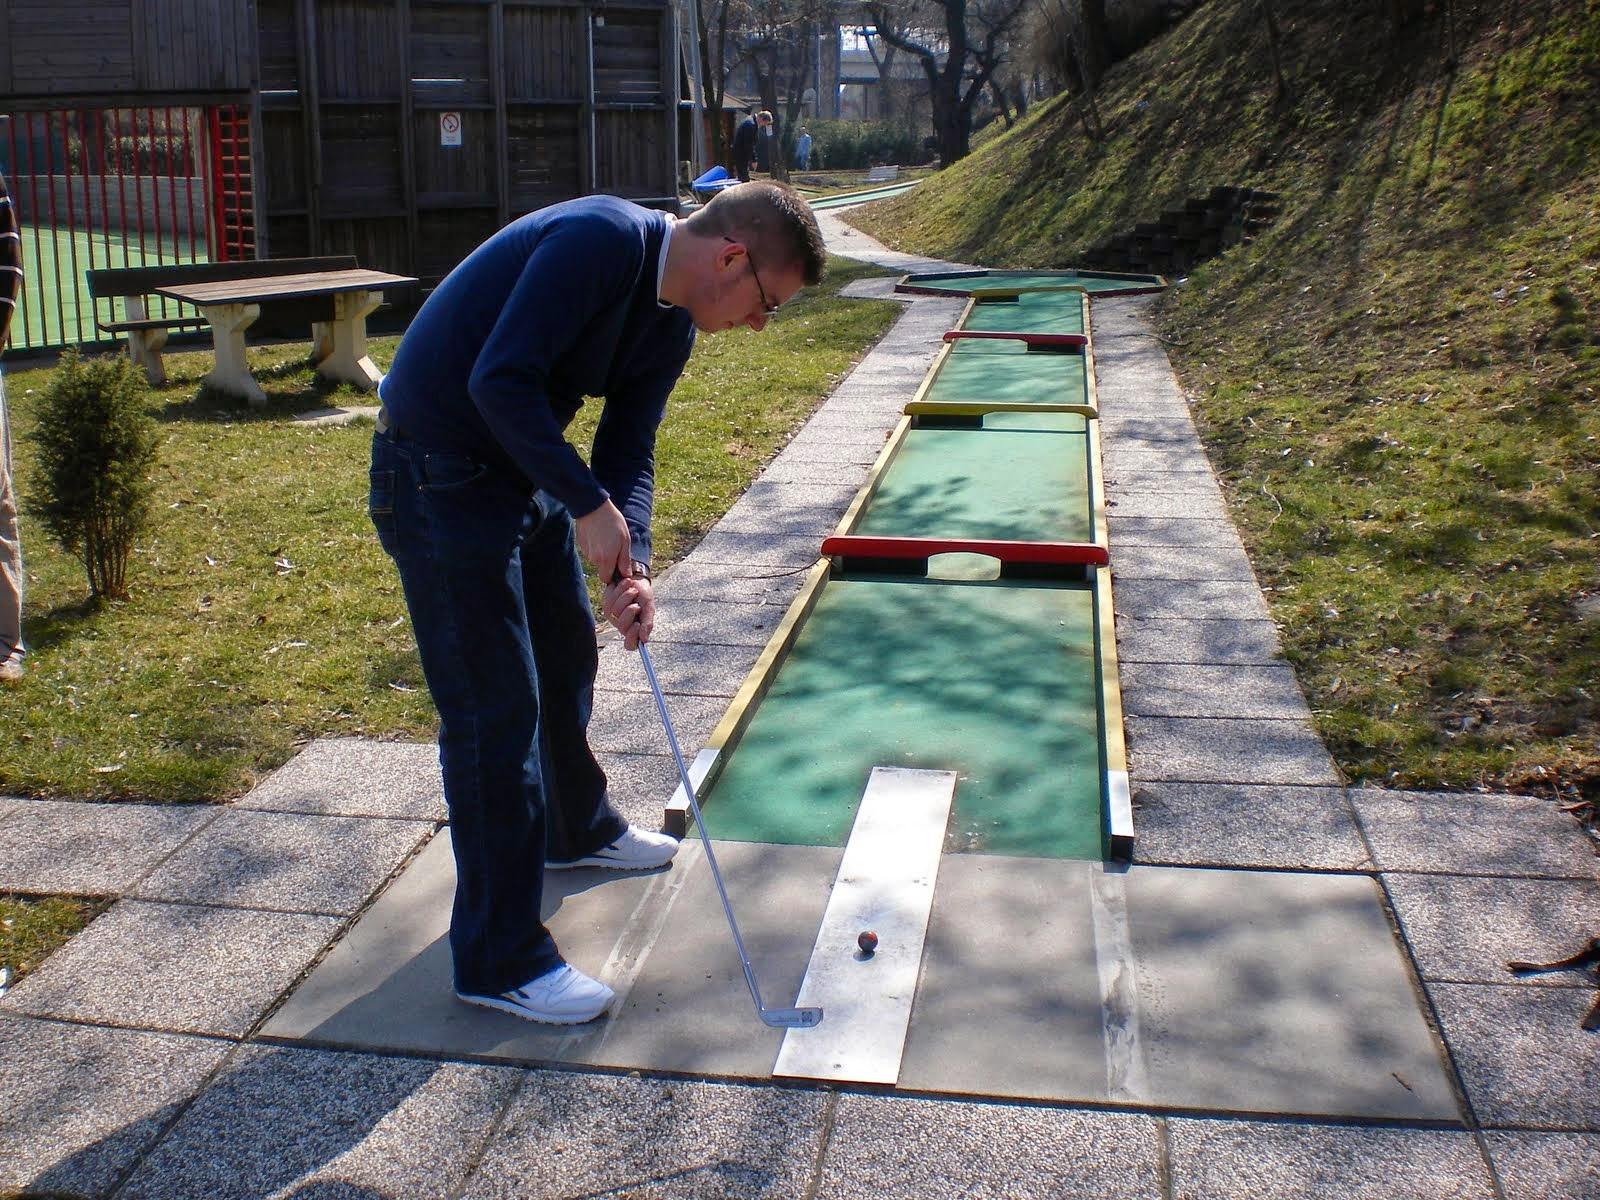 Playing the Swedish Felt Minigolf course at the Askoe Wien Wasserpark in Vienna, Austria